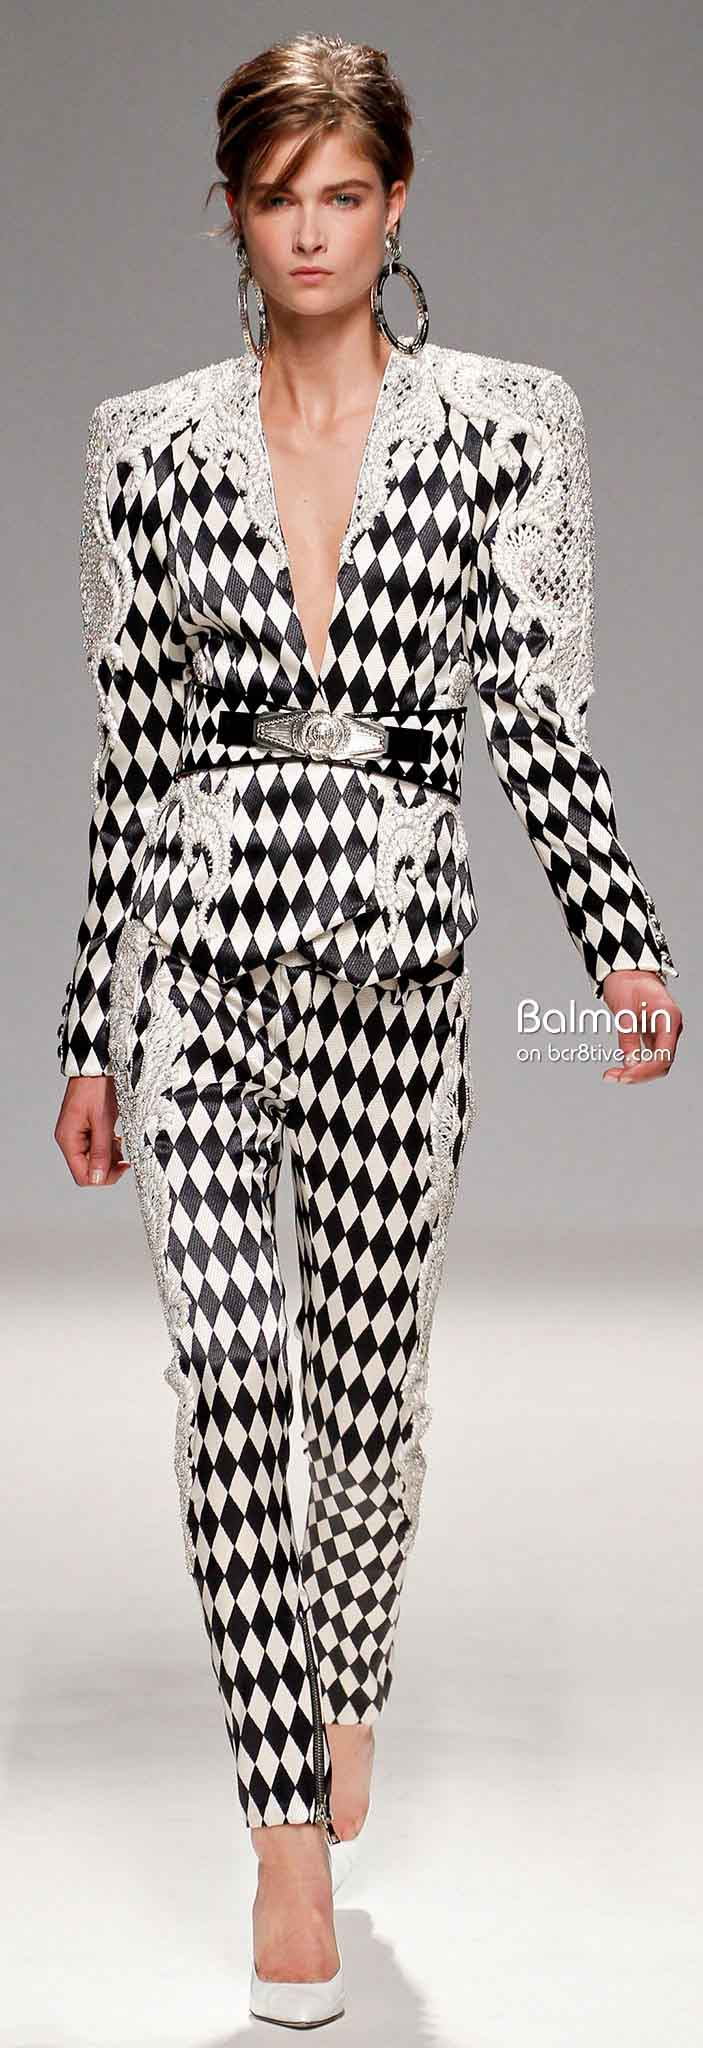 Balmain Spring Summer 2013 Ready to Wear